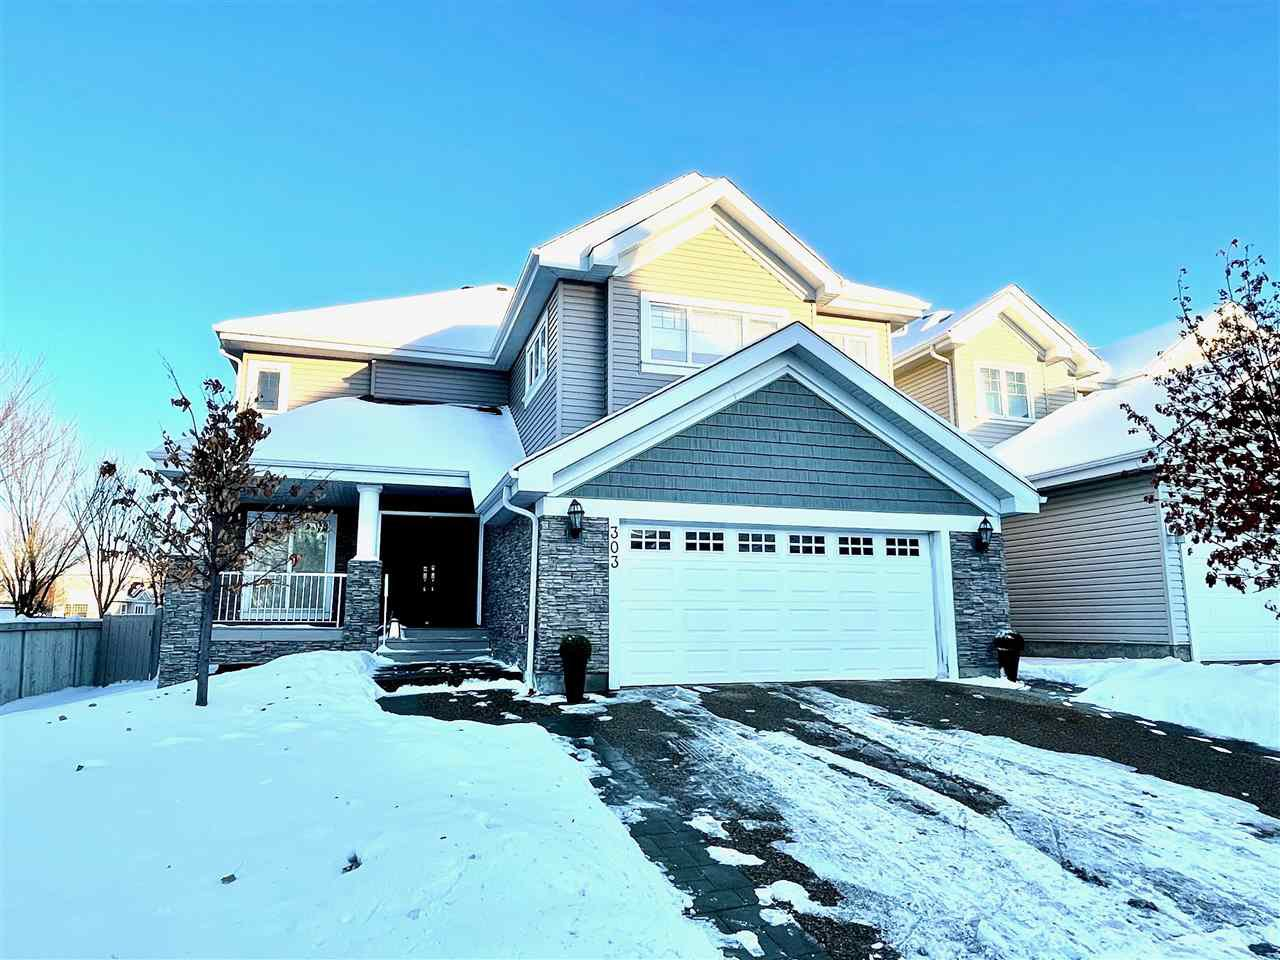 Main Photo: 303 SUMMERSIDE Cove in Edmonton: Zone 53 House for sale : MLS®# E4217935